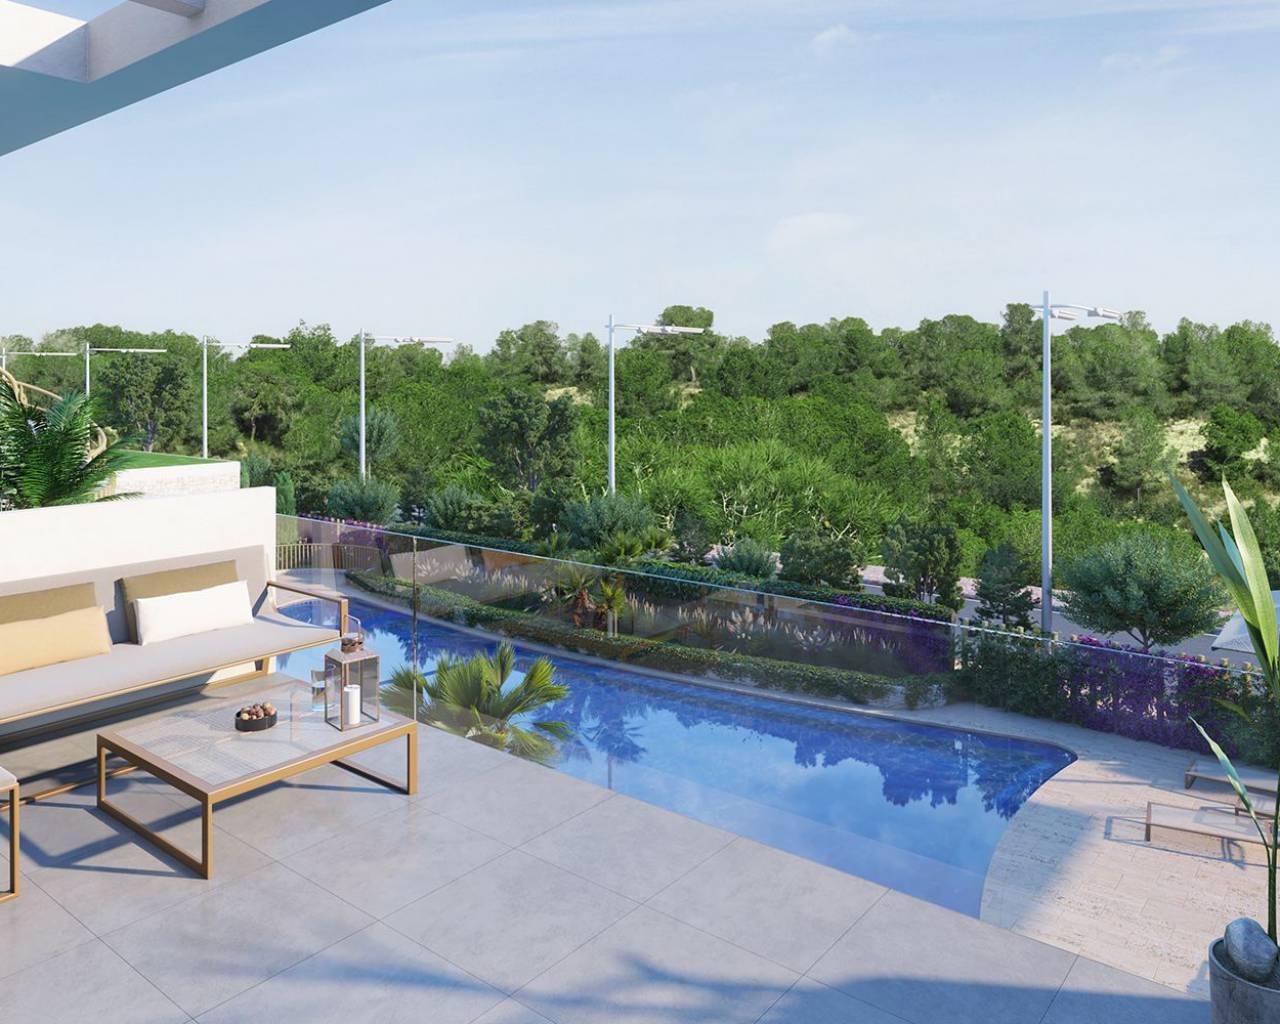 nieuwbouw-appartement-pilar-de-la-horadada_5790_xl